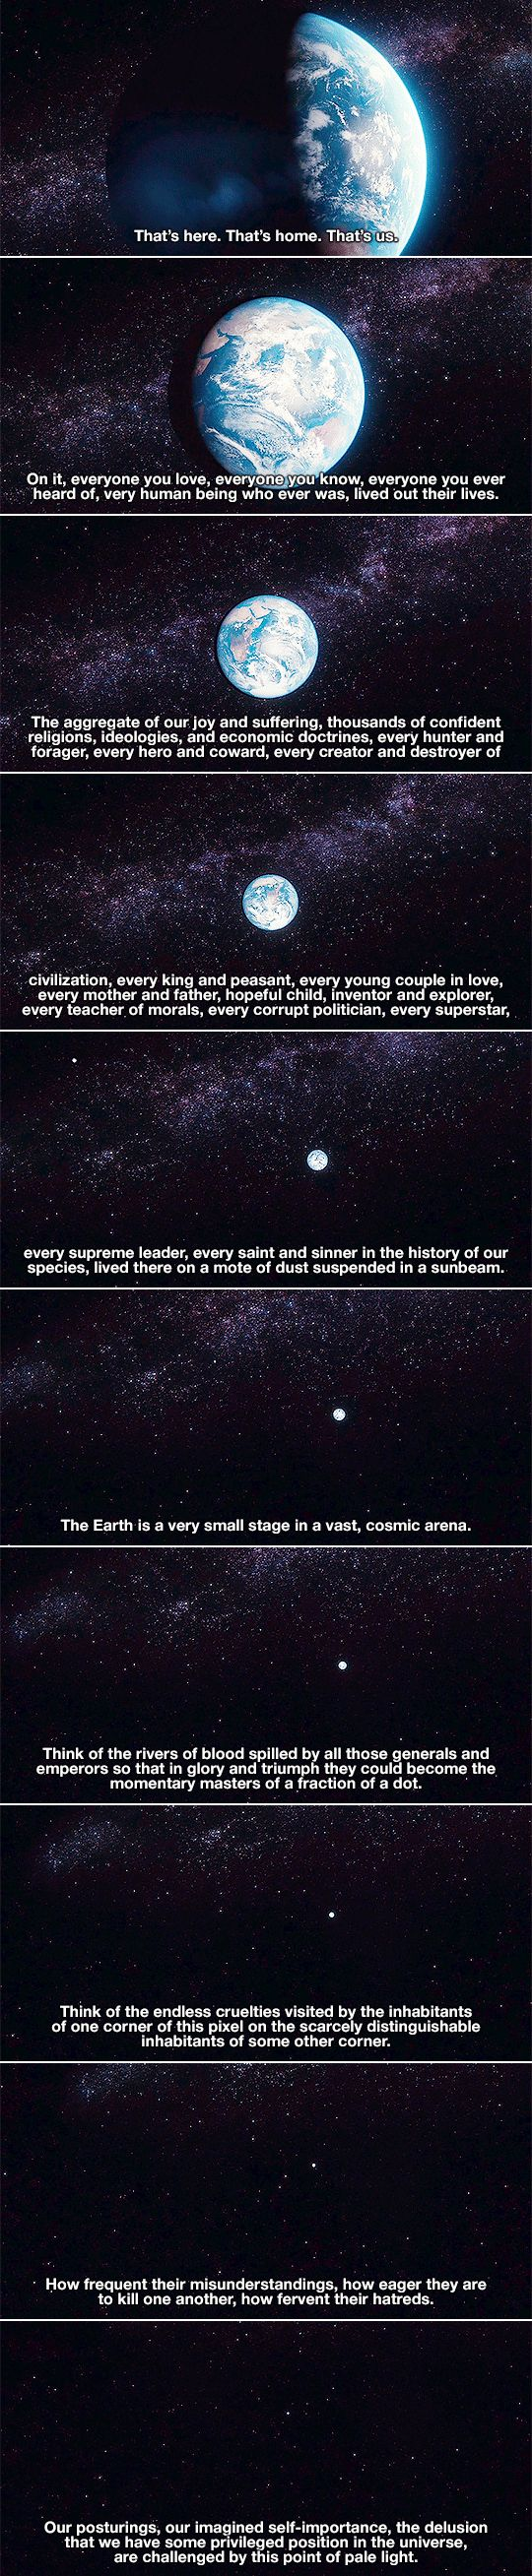 - Carl Sagan, Cosmos: A Spacetime Odyssey